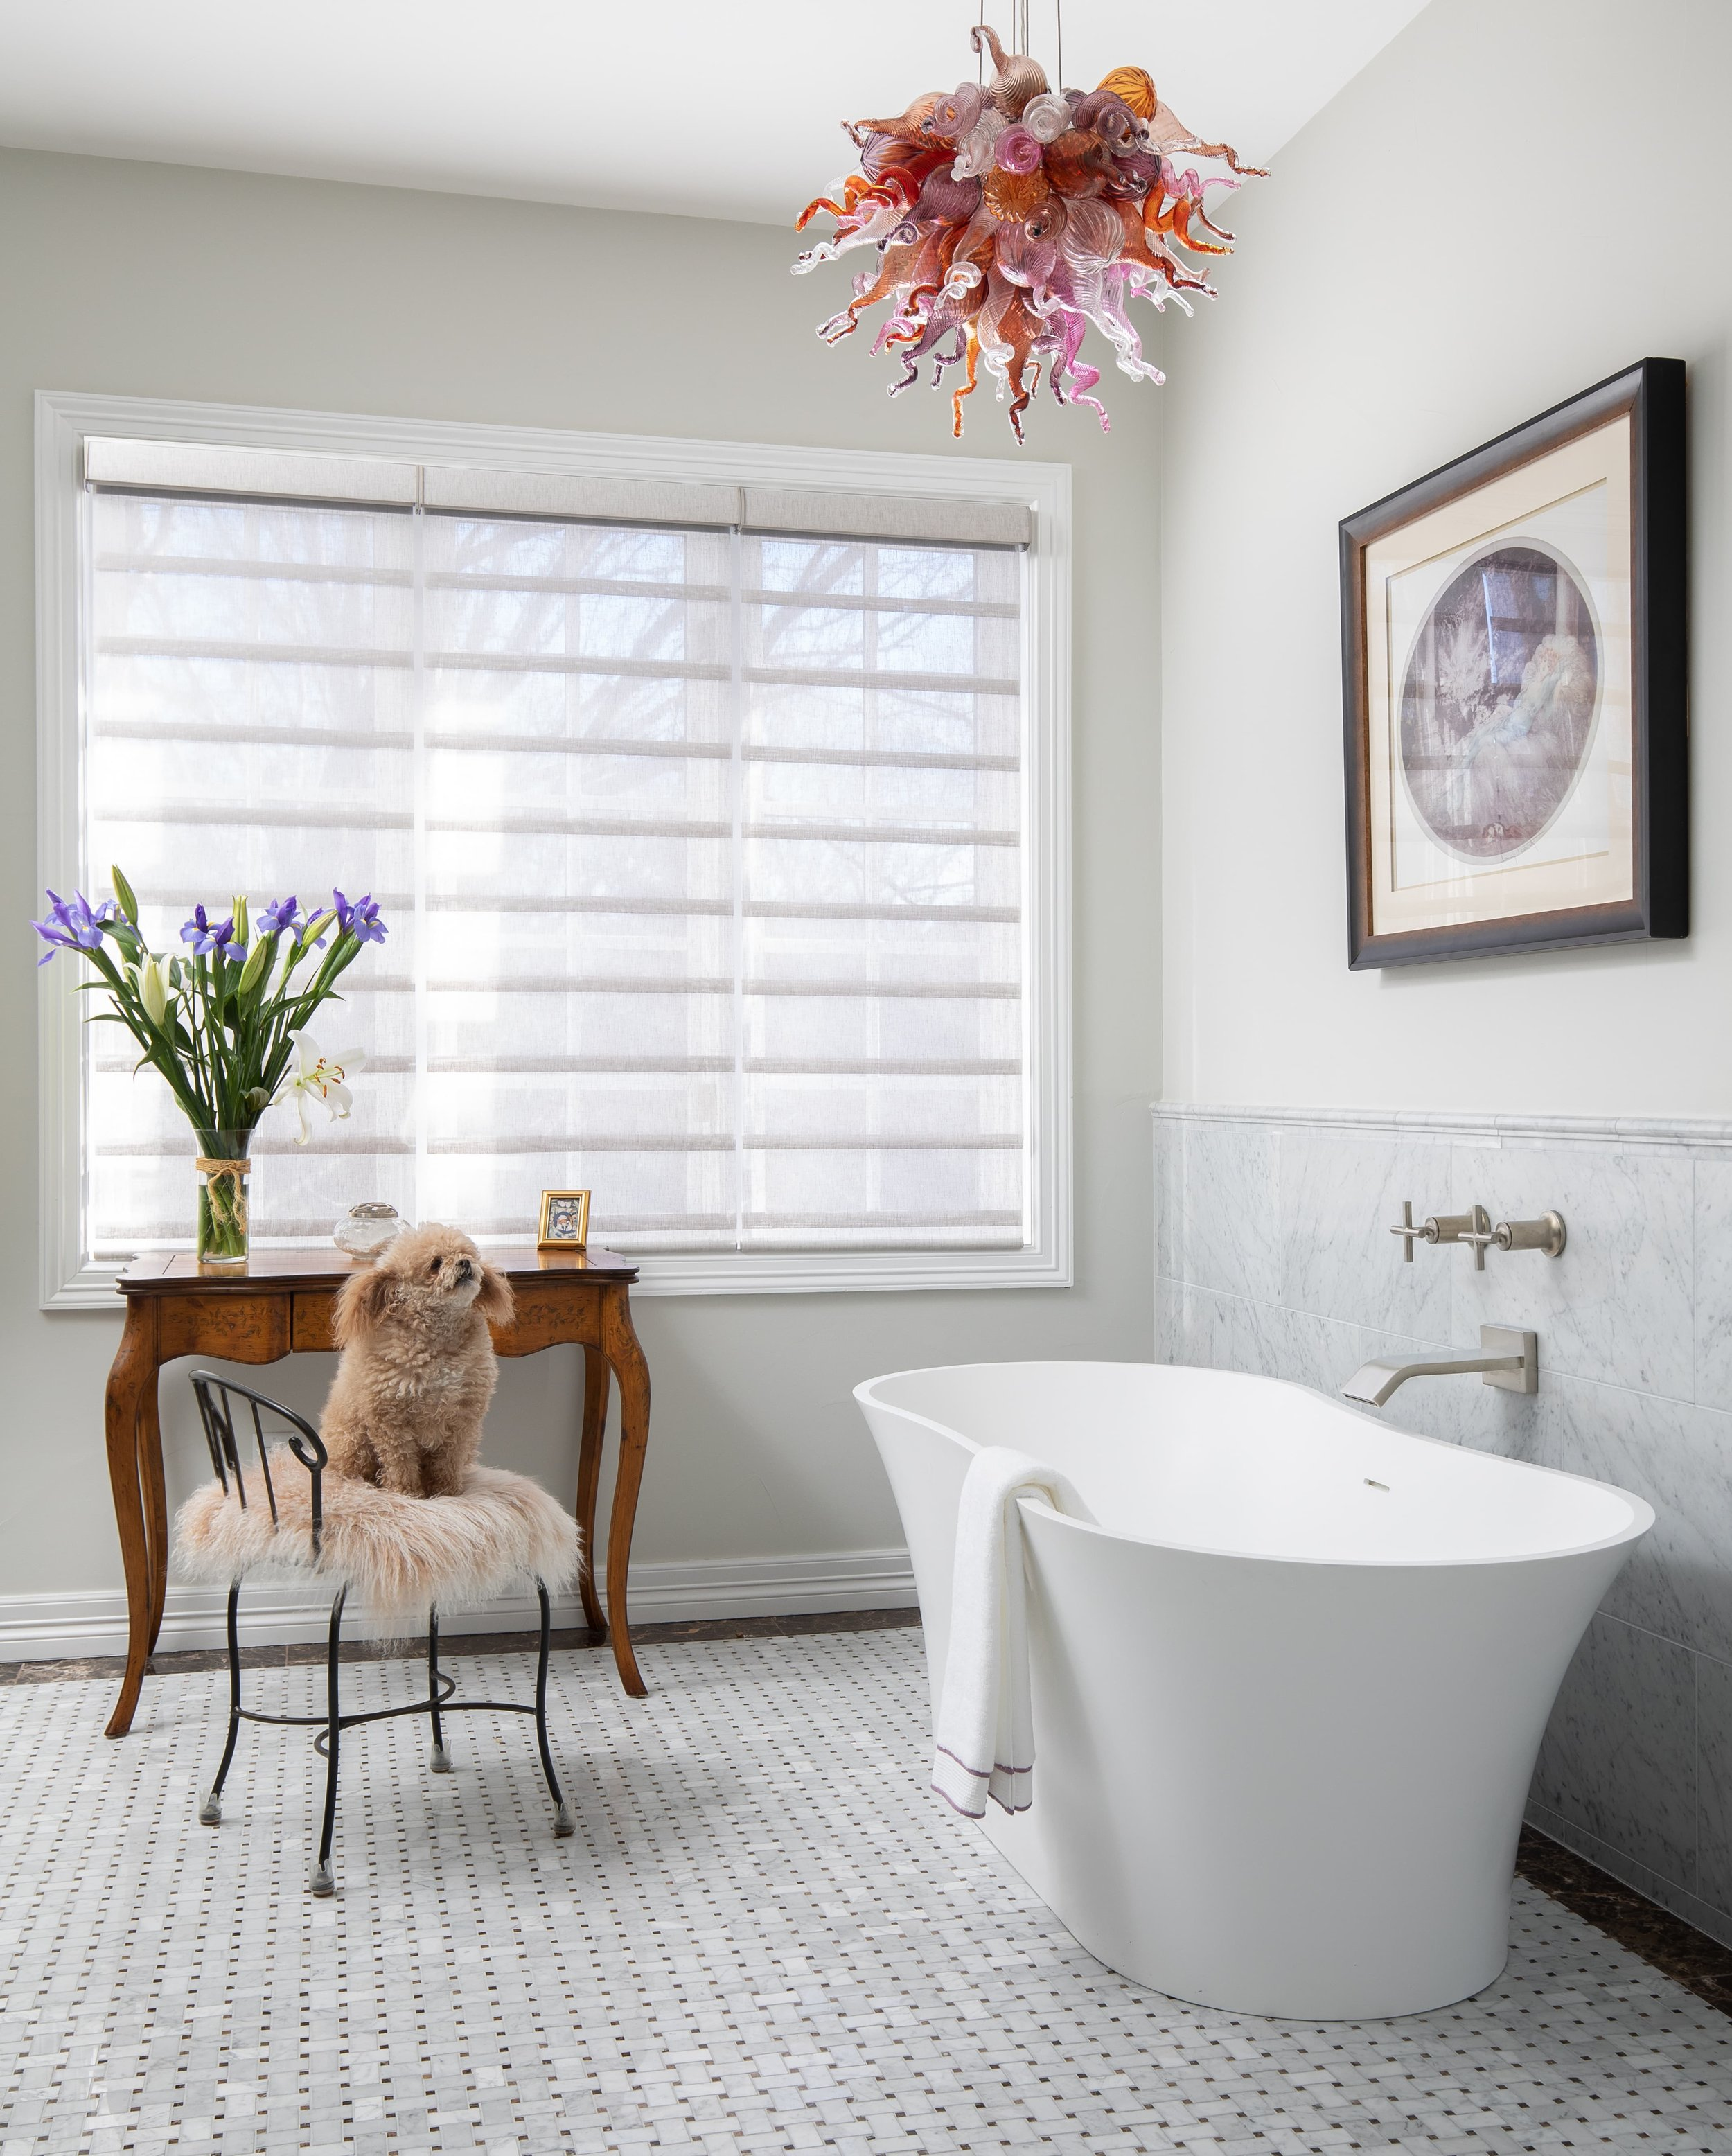 20180123_studio design_monroe house_master bath_photo by timothy gormley_www.tgimage.com_02.jpg